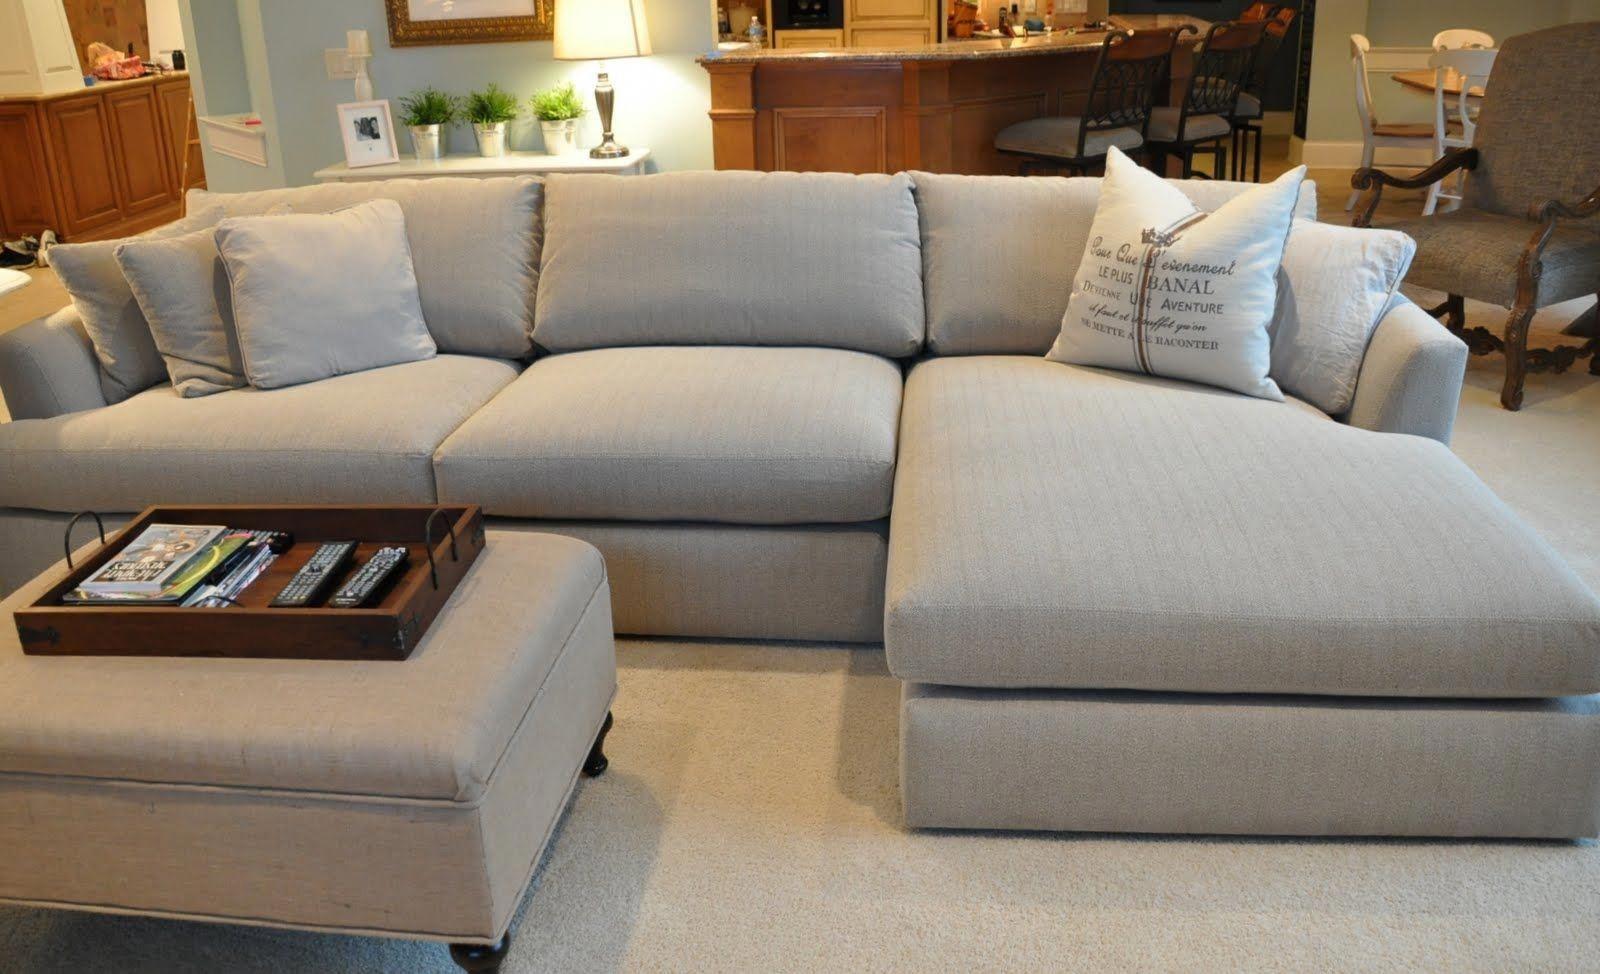 Pleasing Arhaus Emory Sectional Sofa Smalllivingroomsofaoffices In Customarchery Wood Chair Design Ideas Customarcherynet